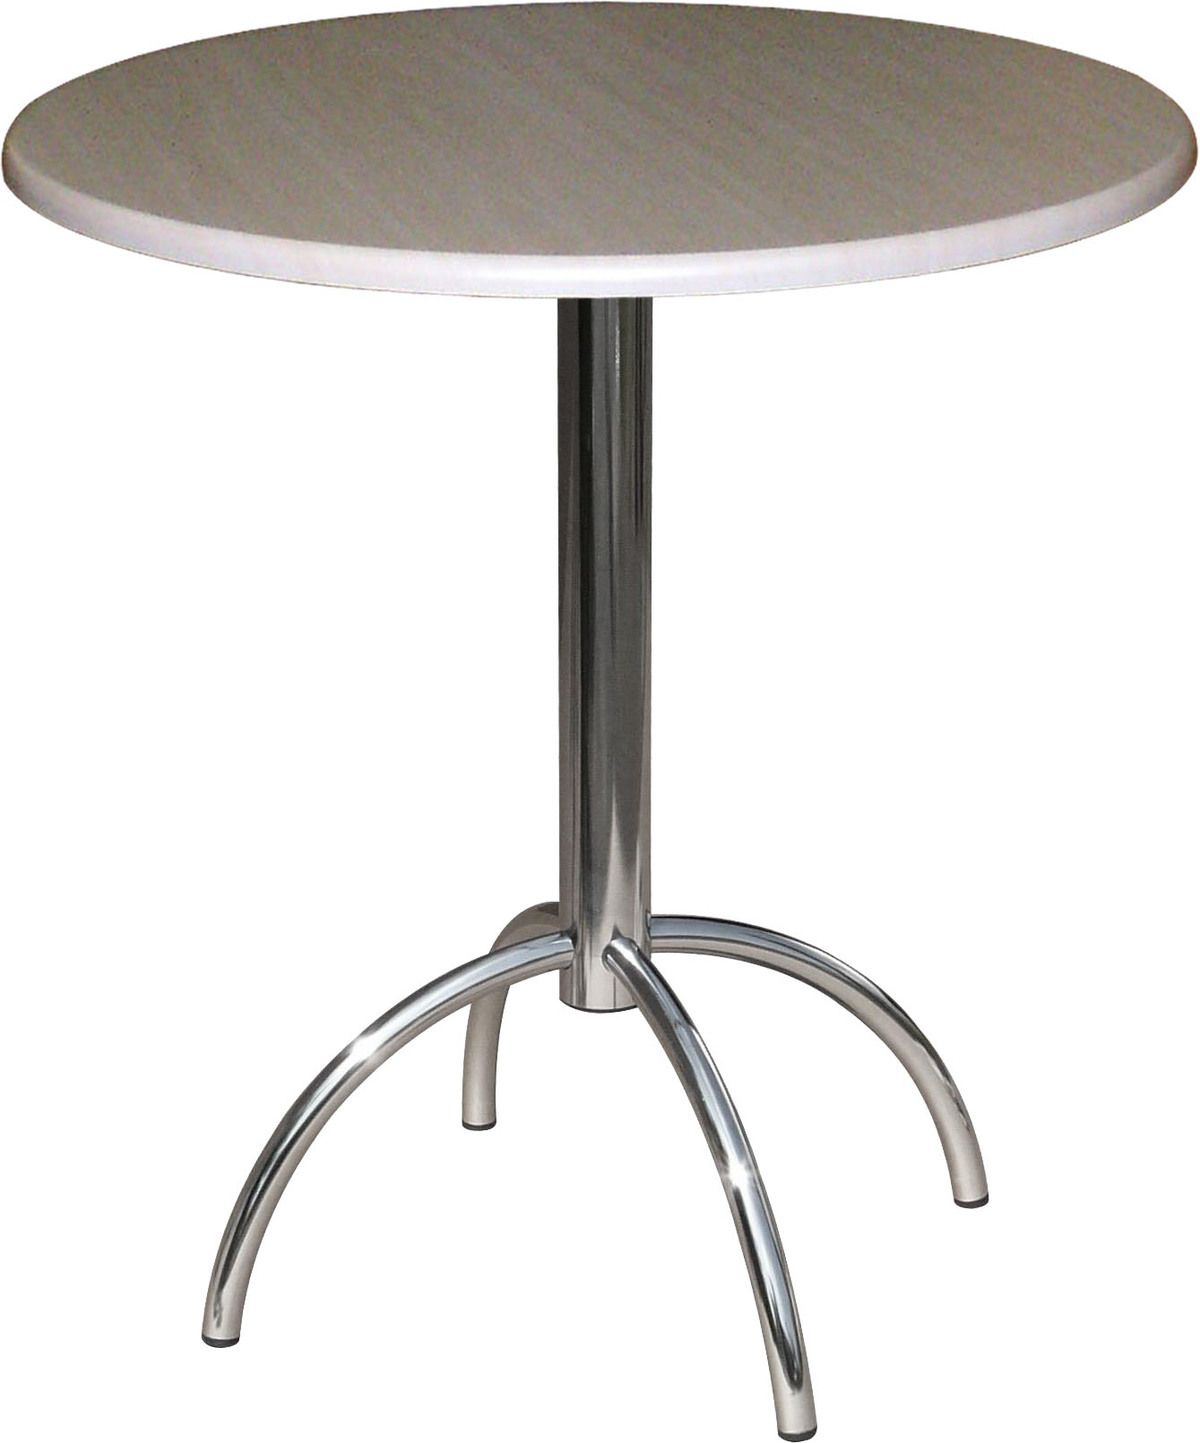 Стол (арт.М145) дуб беленыйМебель для дома<br><br><br>Артикул: М145<br>Бренд: Ravta<br>Страна-изготовитель: Россия<br>Цвет: дуб беленый<br>Вид мебели: Стол<br>Каркас мебели: металлик<br>Тип материала мебели: меламин